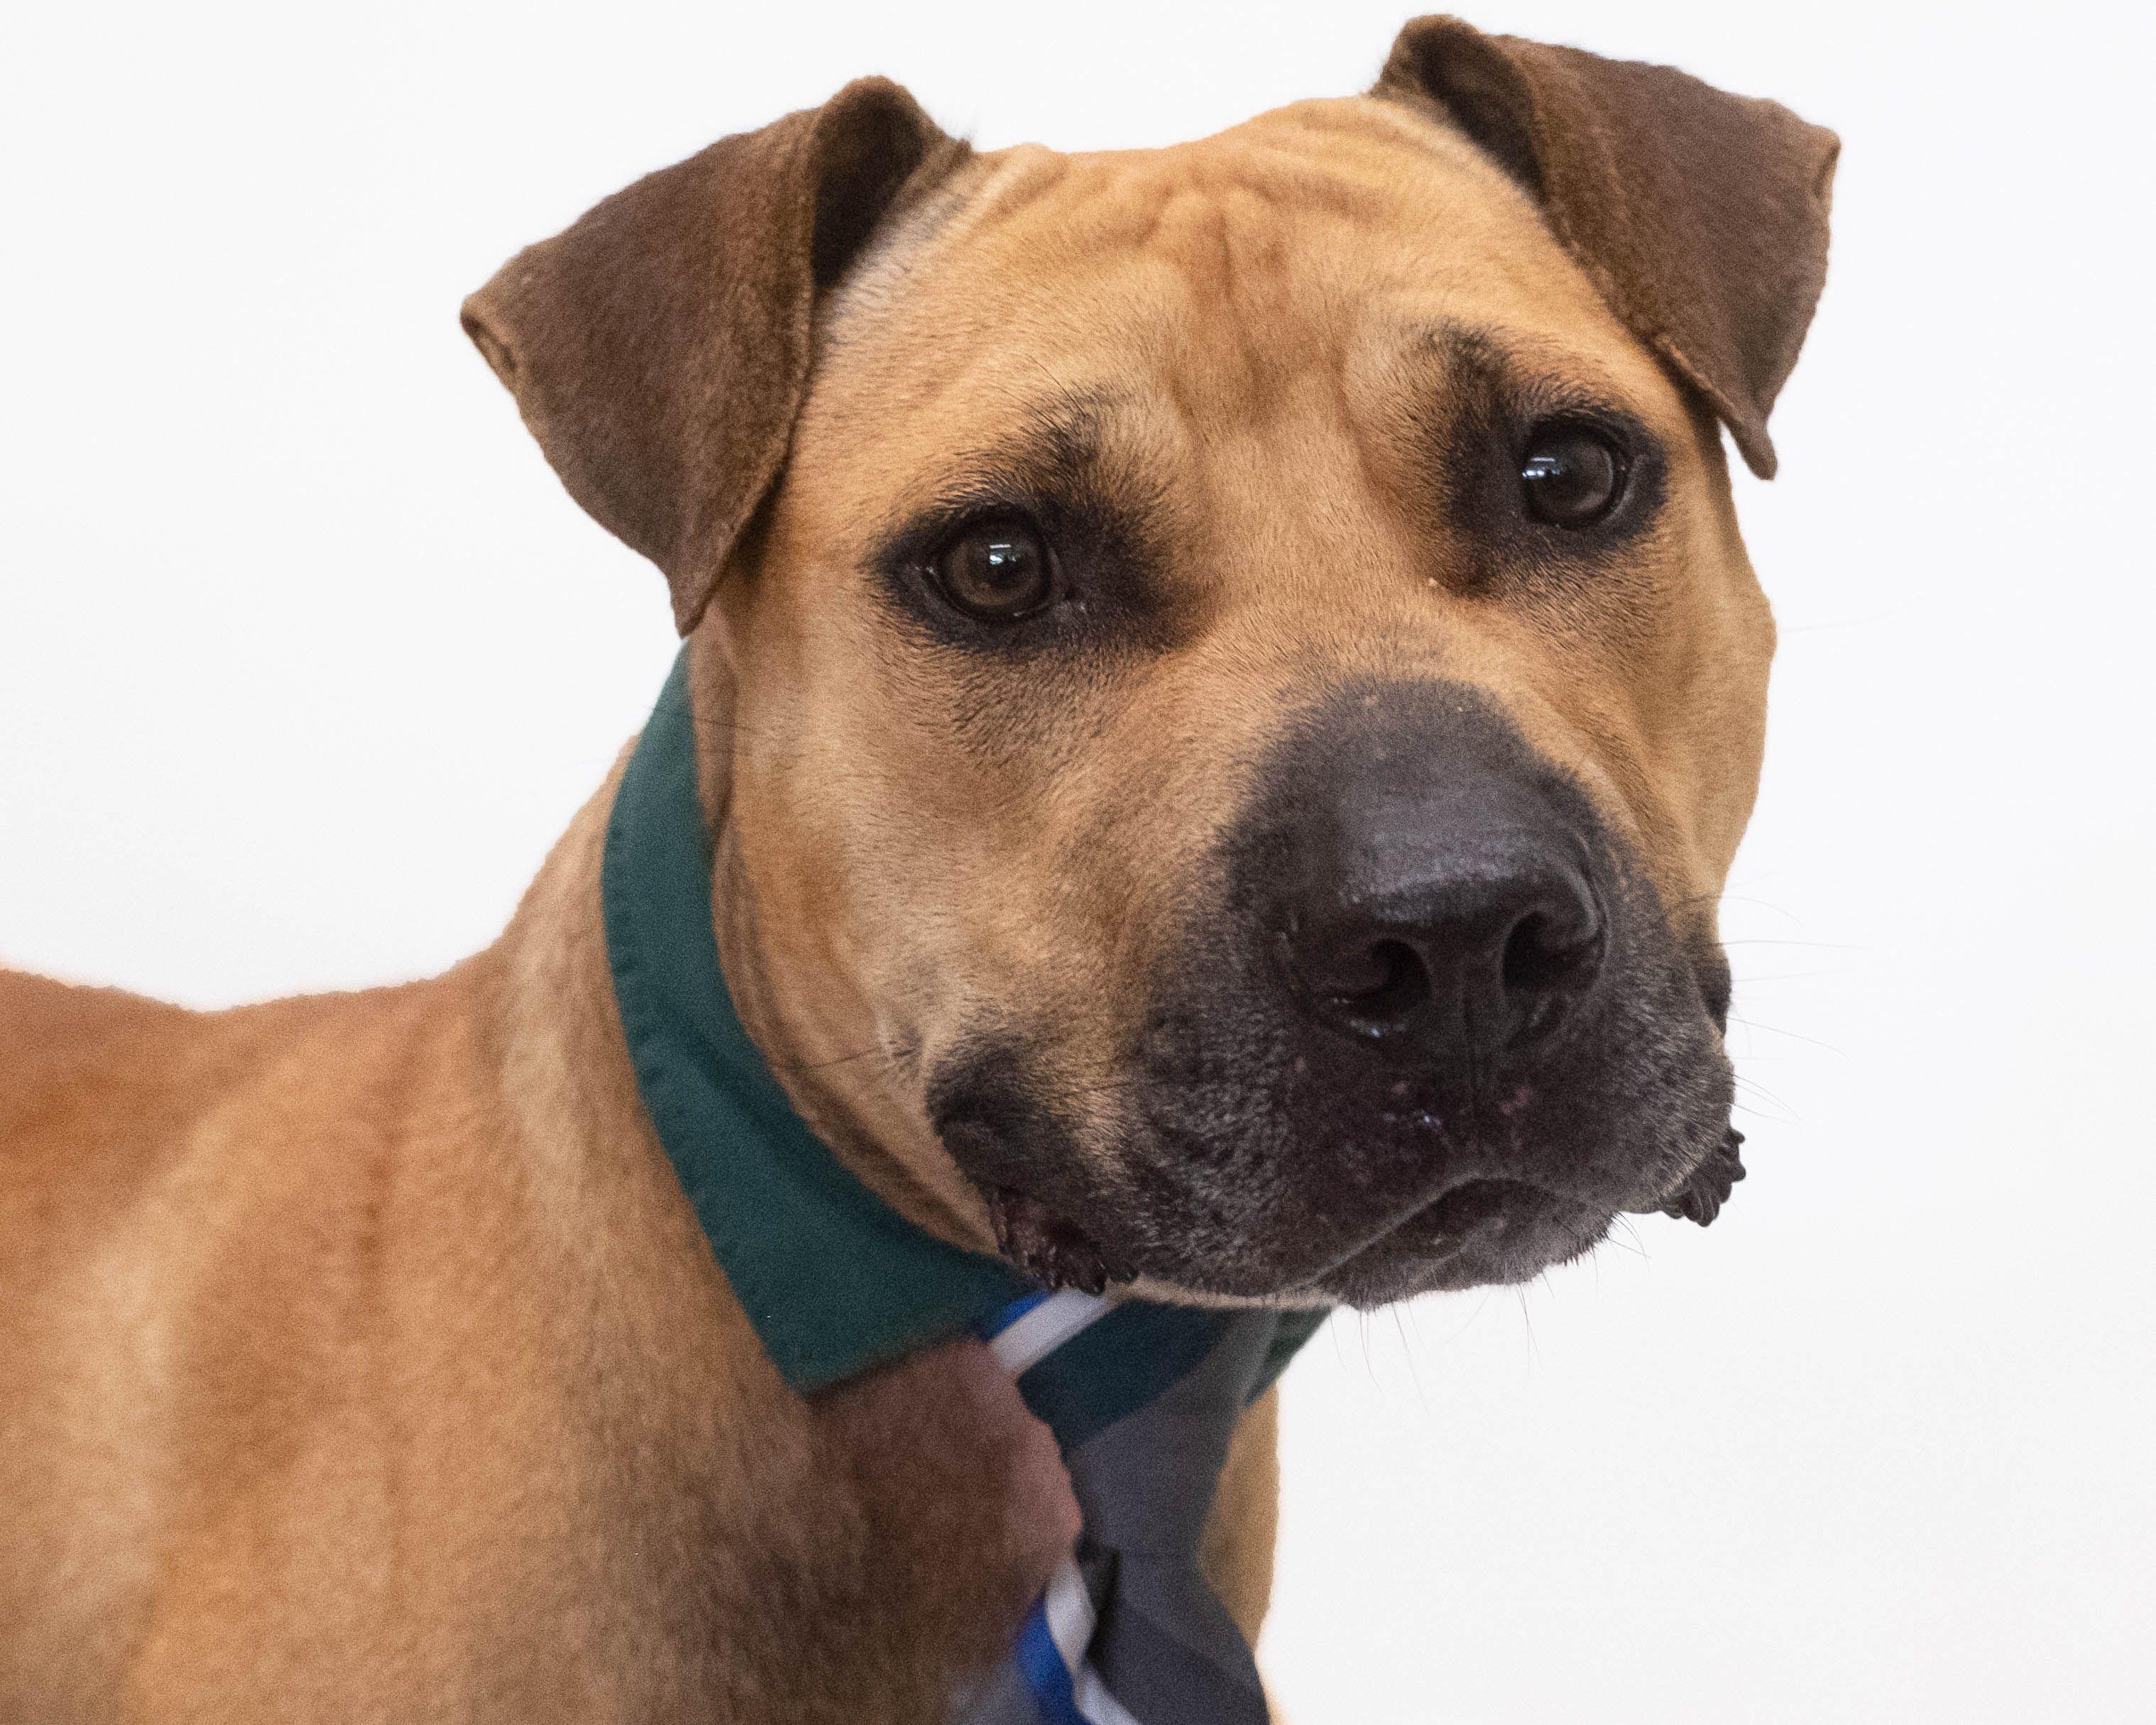 Adoptable Dogs Animal Shelter Dog Adoption Animals